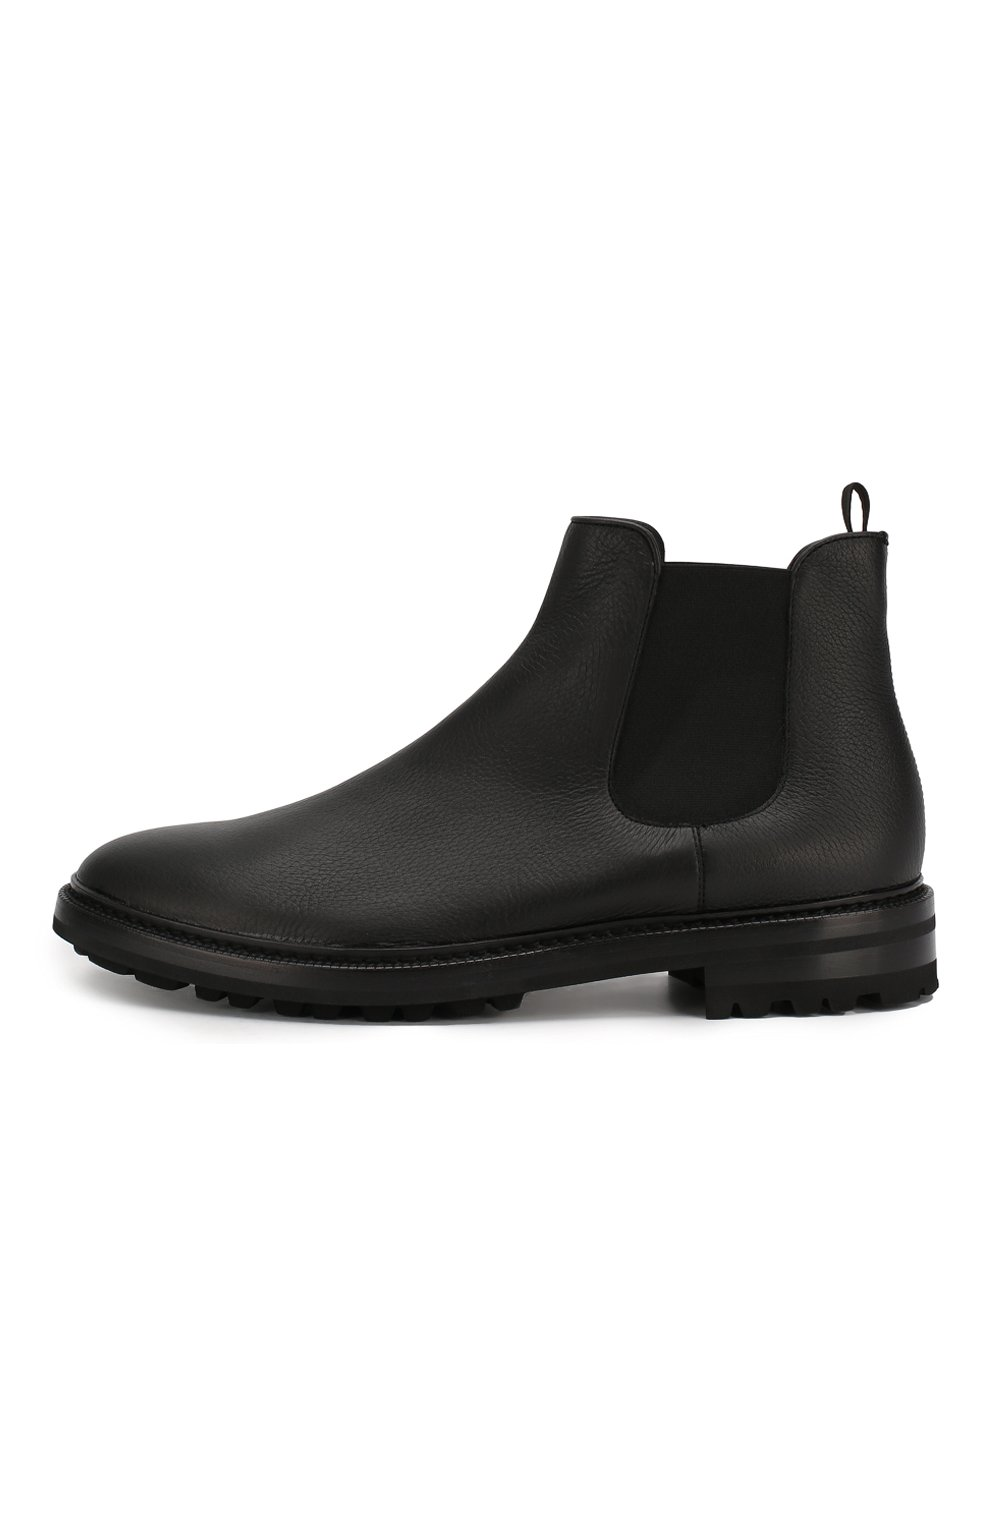 Мужские кожаные челси GIORGIO ARMANI черного цвета, арт. X2M296/XF407   Фото 3